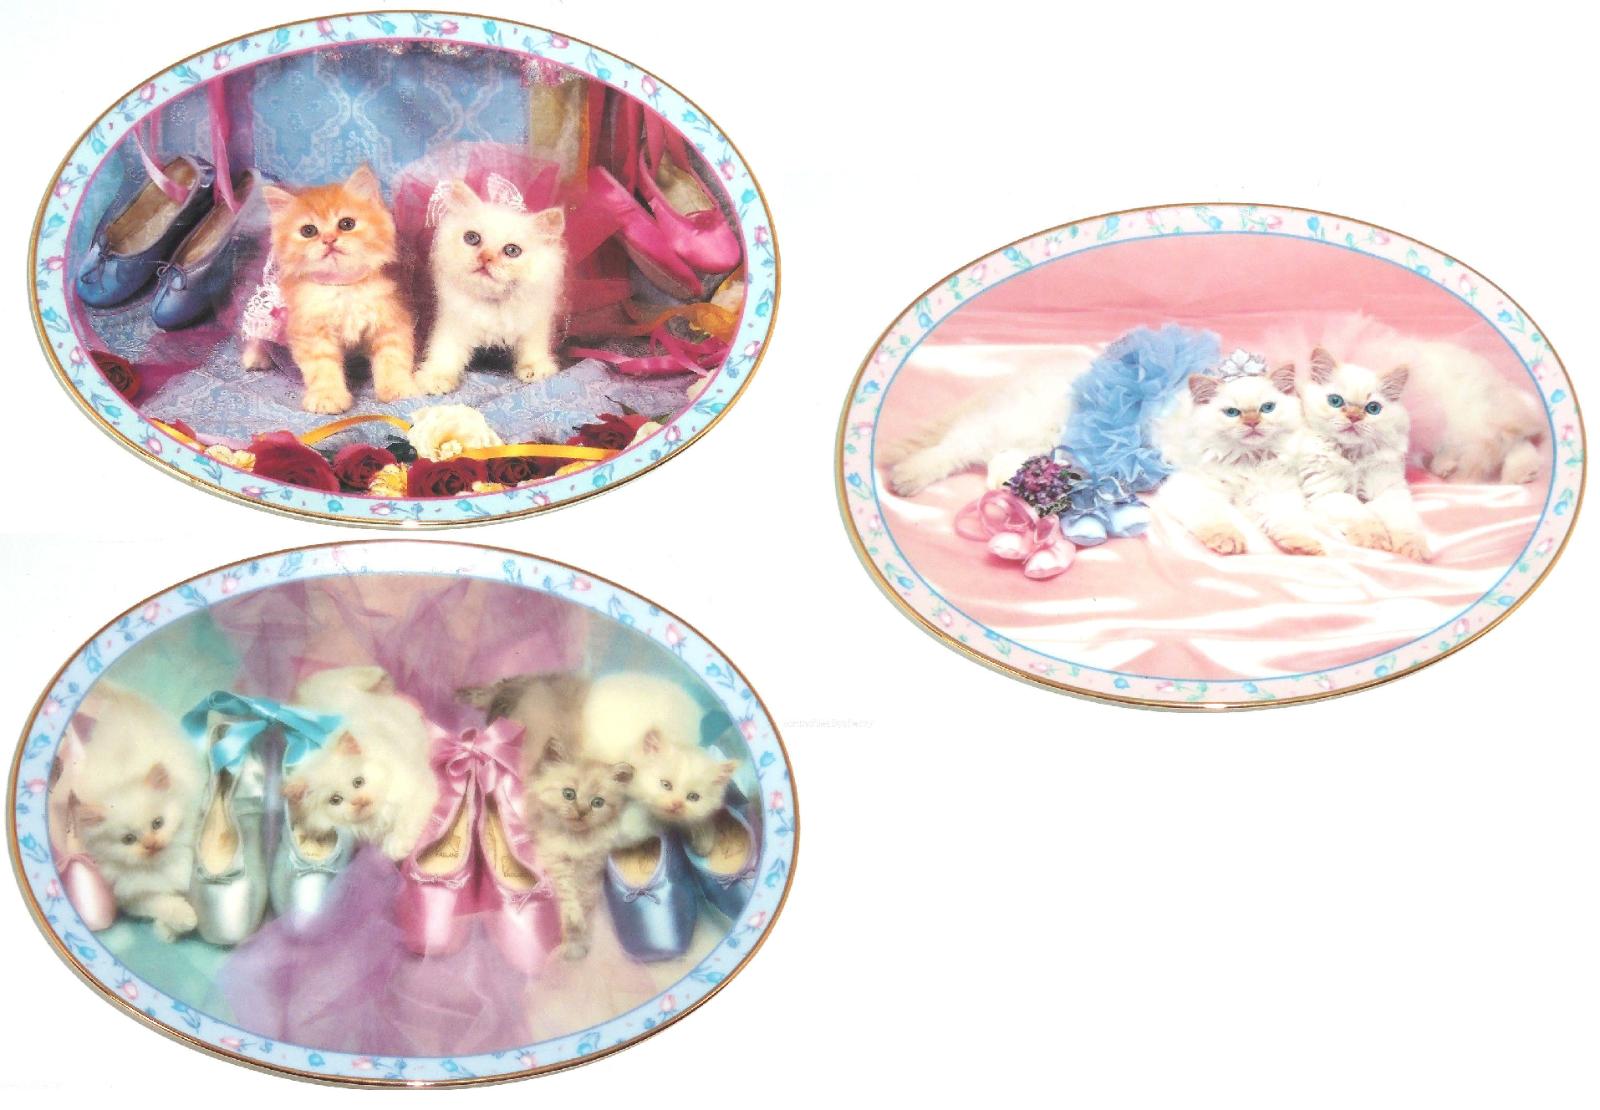 Prima Ballerinas Kitten Collector Plate Danbury Mint David Belda Cats Kitty